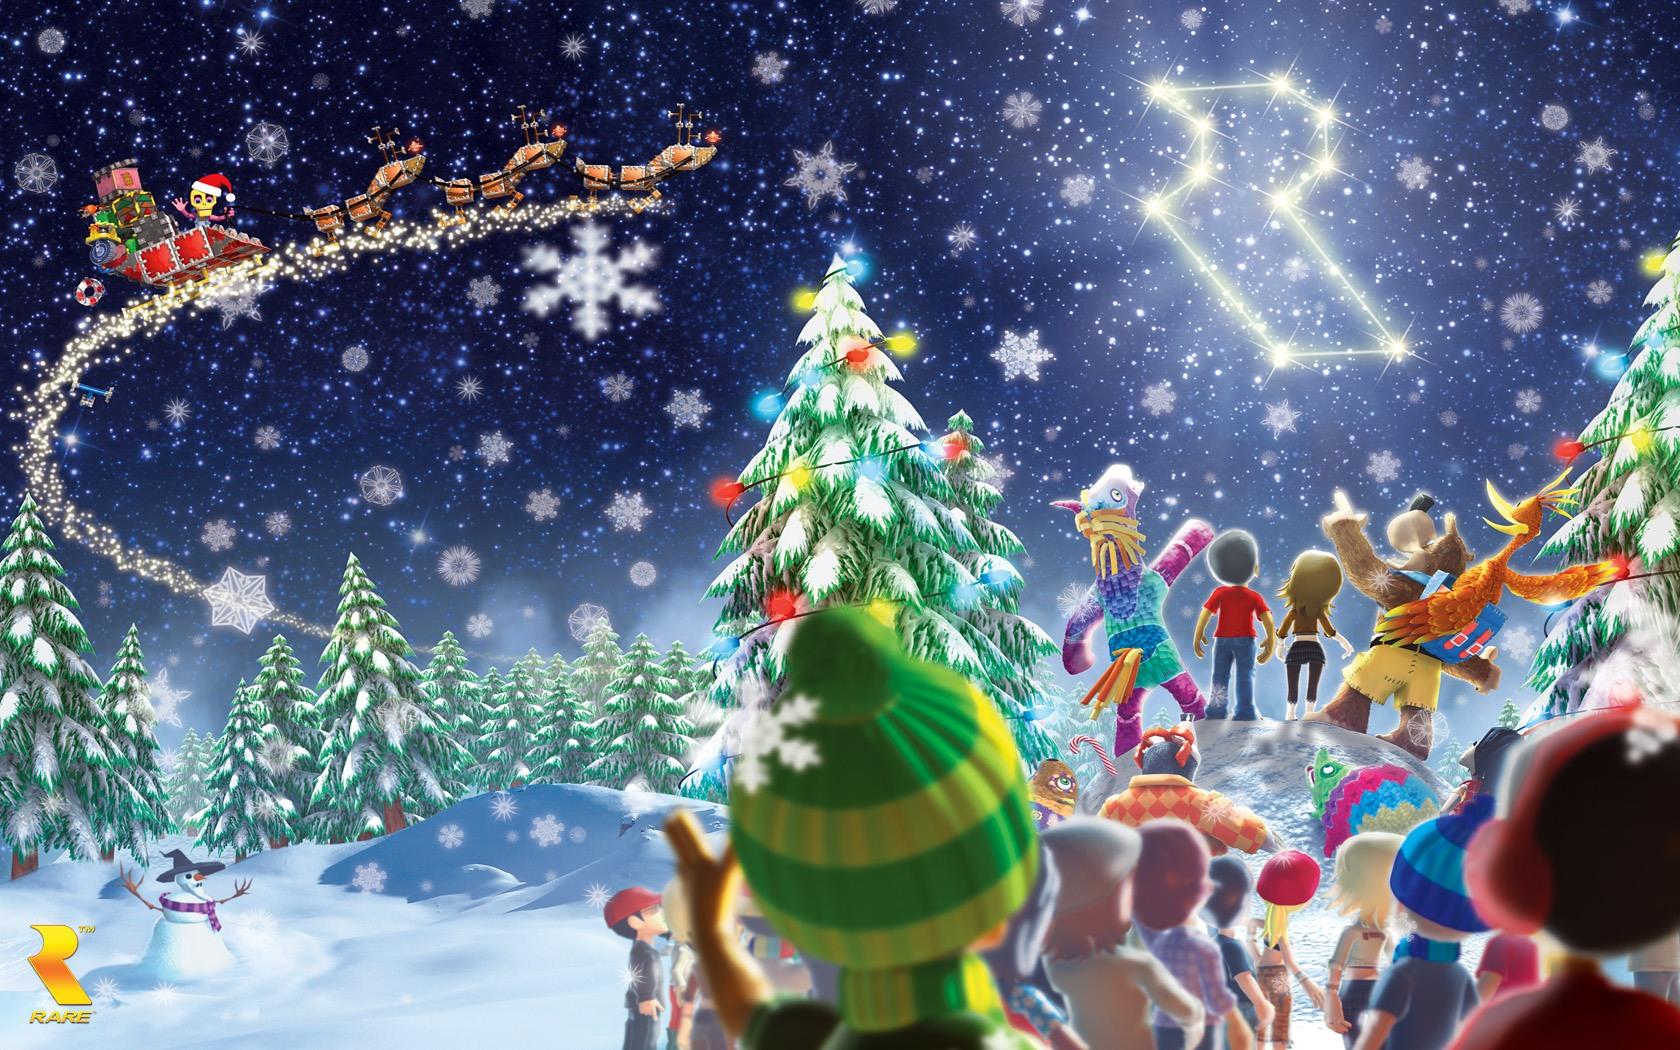 Gaming Christmas Wallpaper Banjo Kazooie Christmas Fortnite Wallpapers For Christmas 1159167 Hd Wallpaper Backgrounds Download